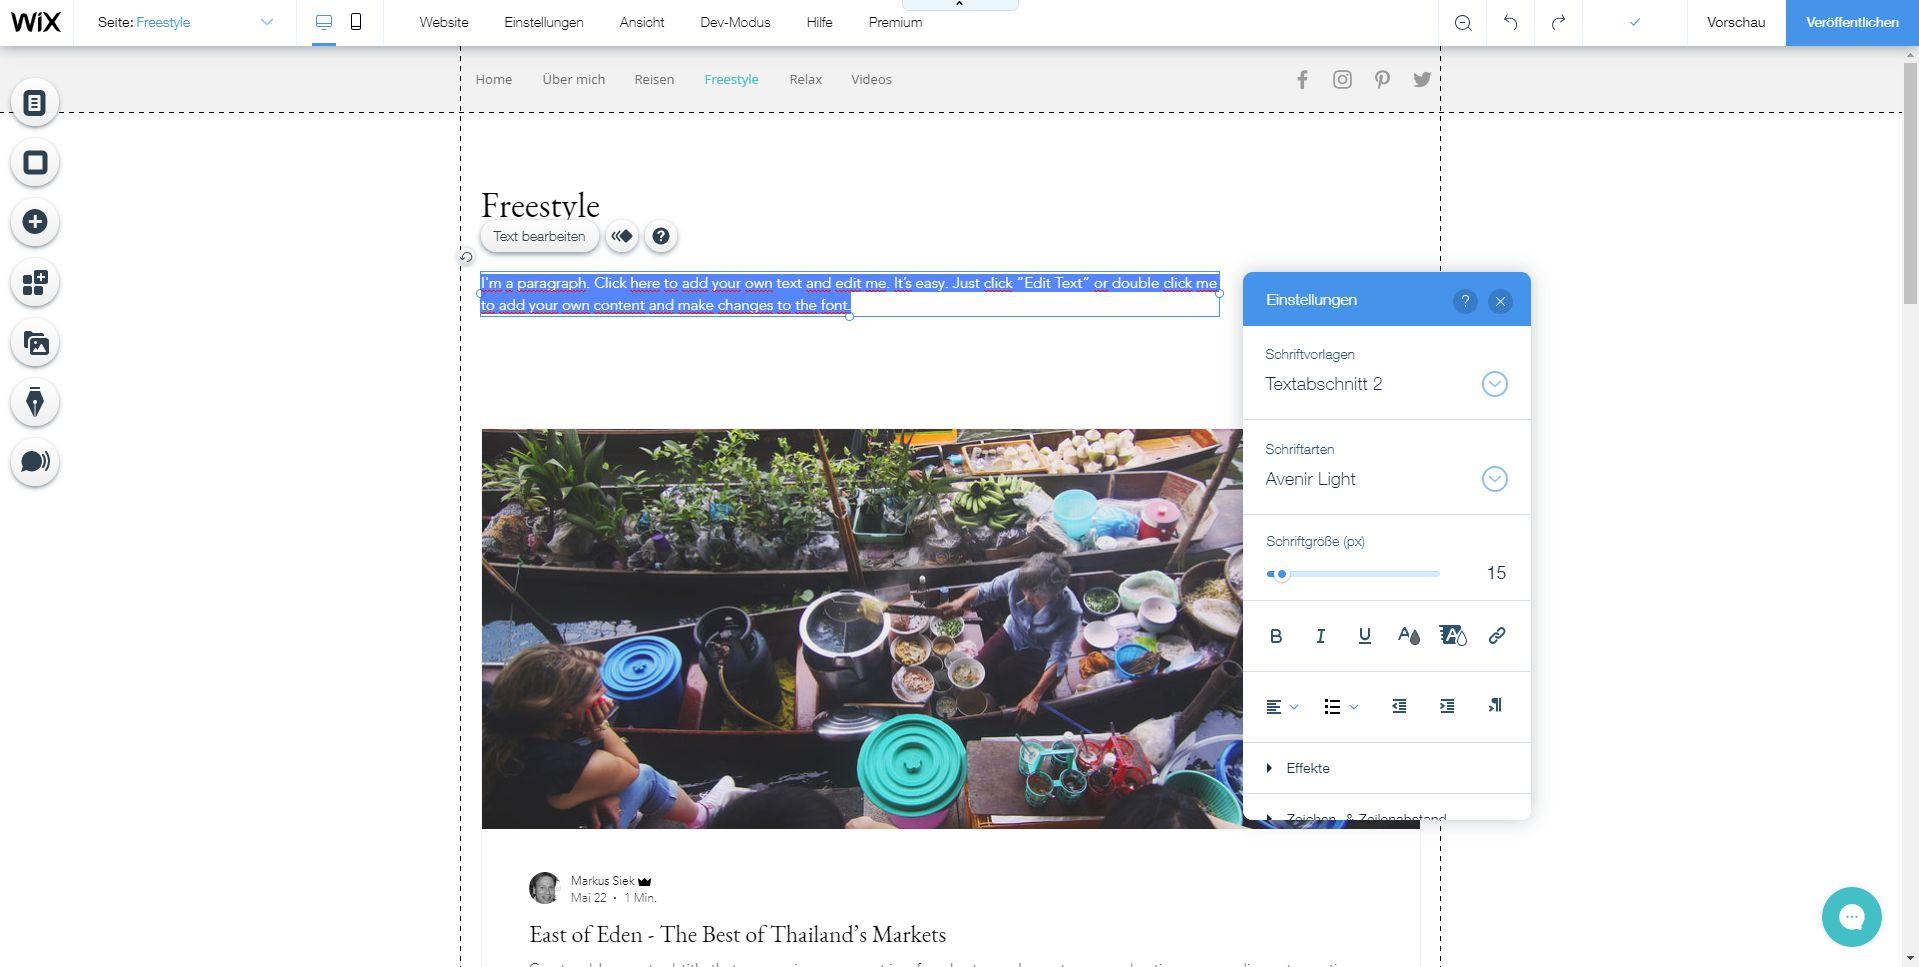 Fotoblog erstellen (2019): Wix Schritt 5